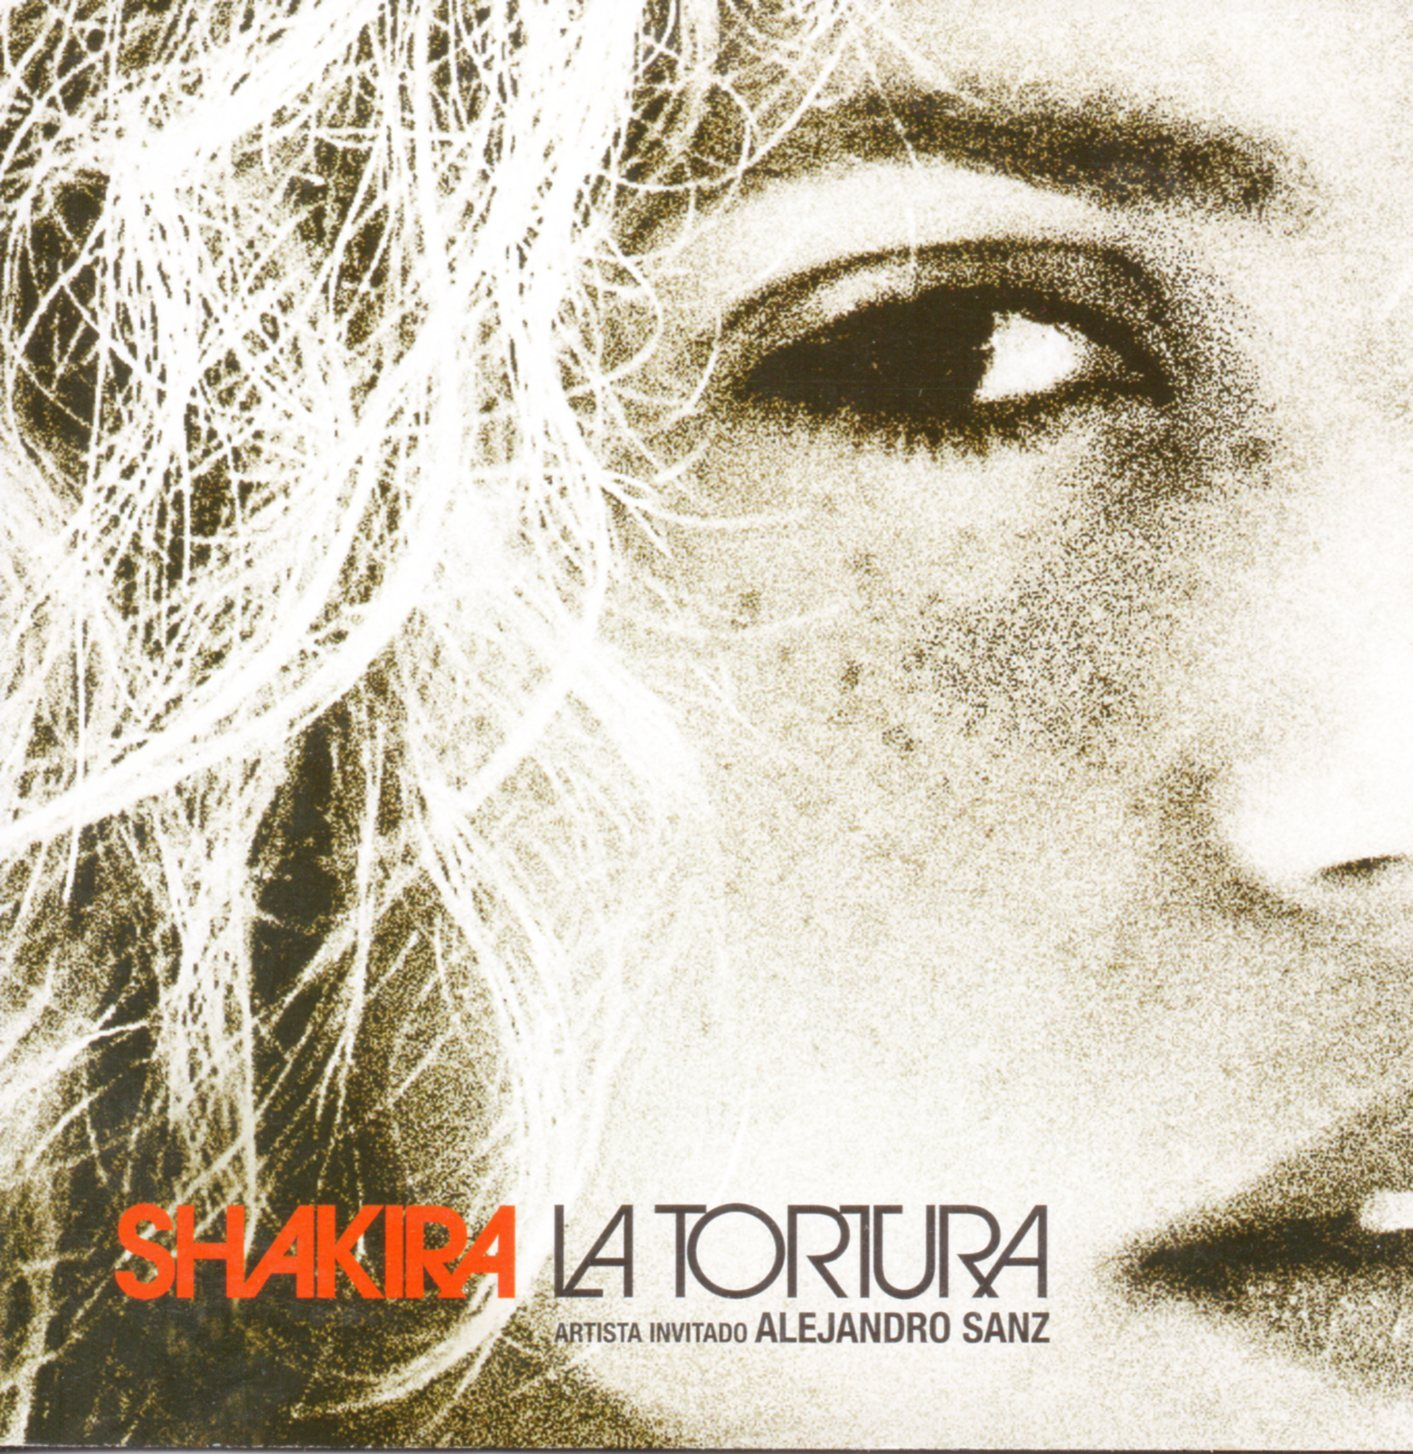 SHAKIRA FEAT ALEJANDRO SANZ - La tortura 2-track CARD SLEEVE - CD single